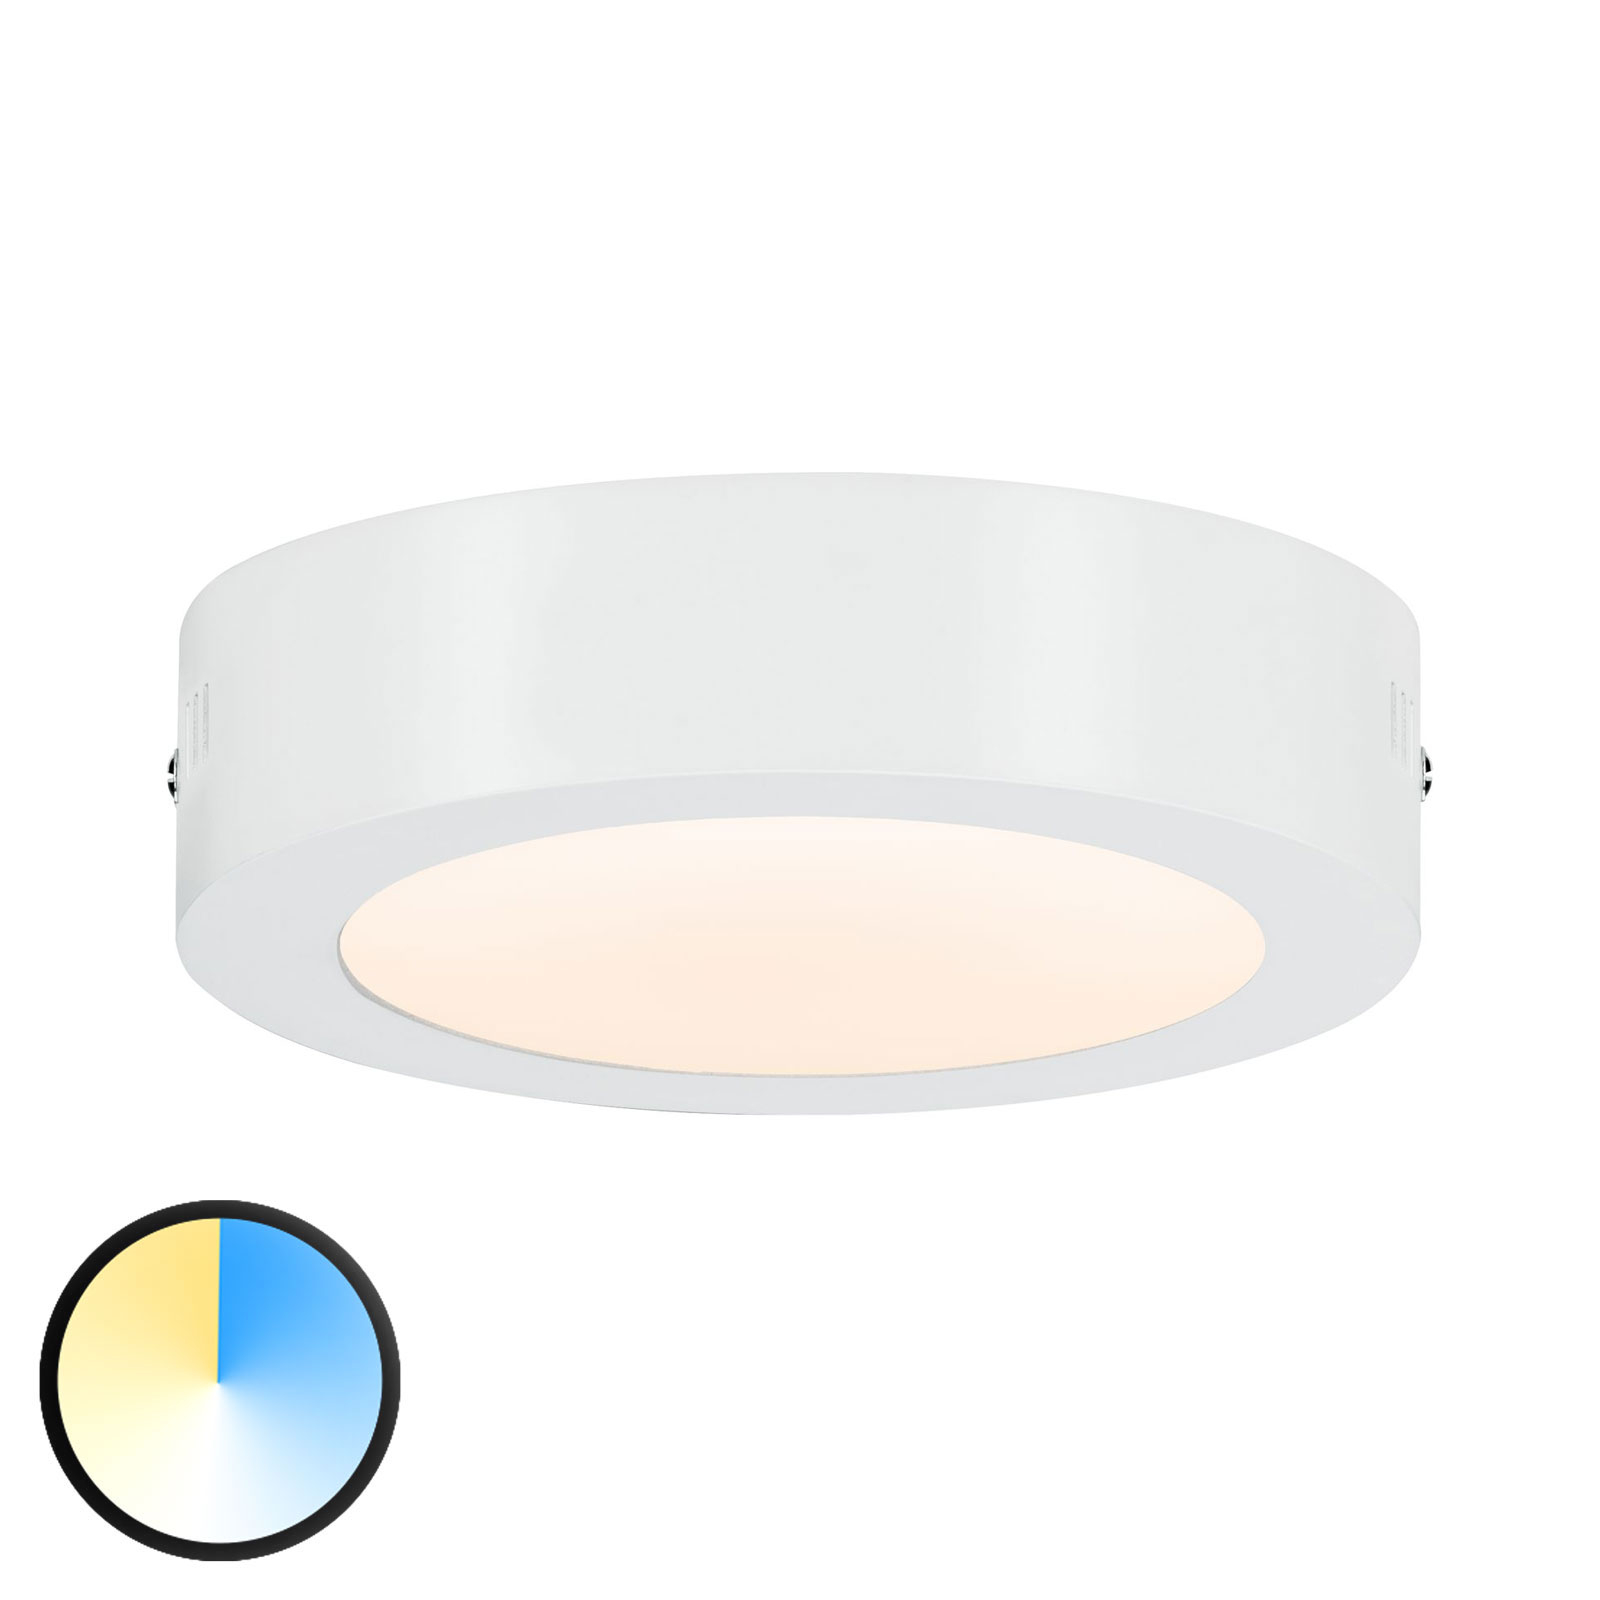 Paulmann Carpo lampa sufitowa LED biała 17cm